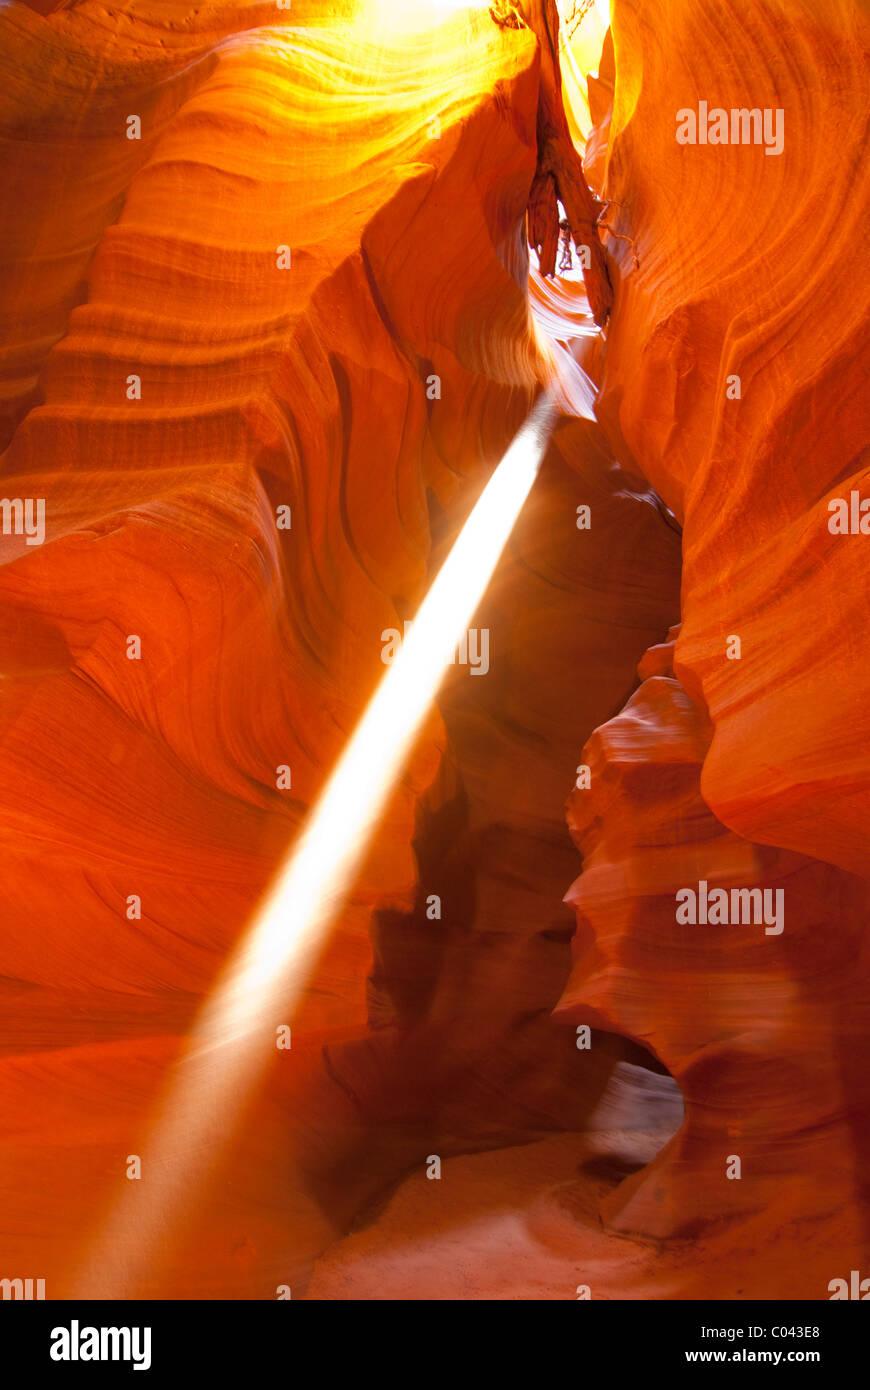 Beautiful games of colors and light at Upper Antelope Canyon, Arizona Stock Photo